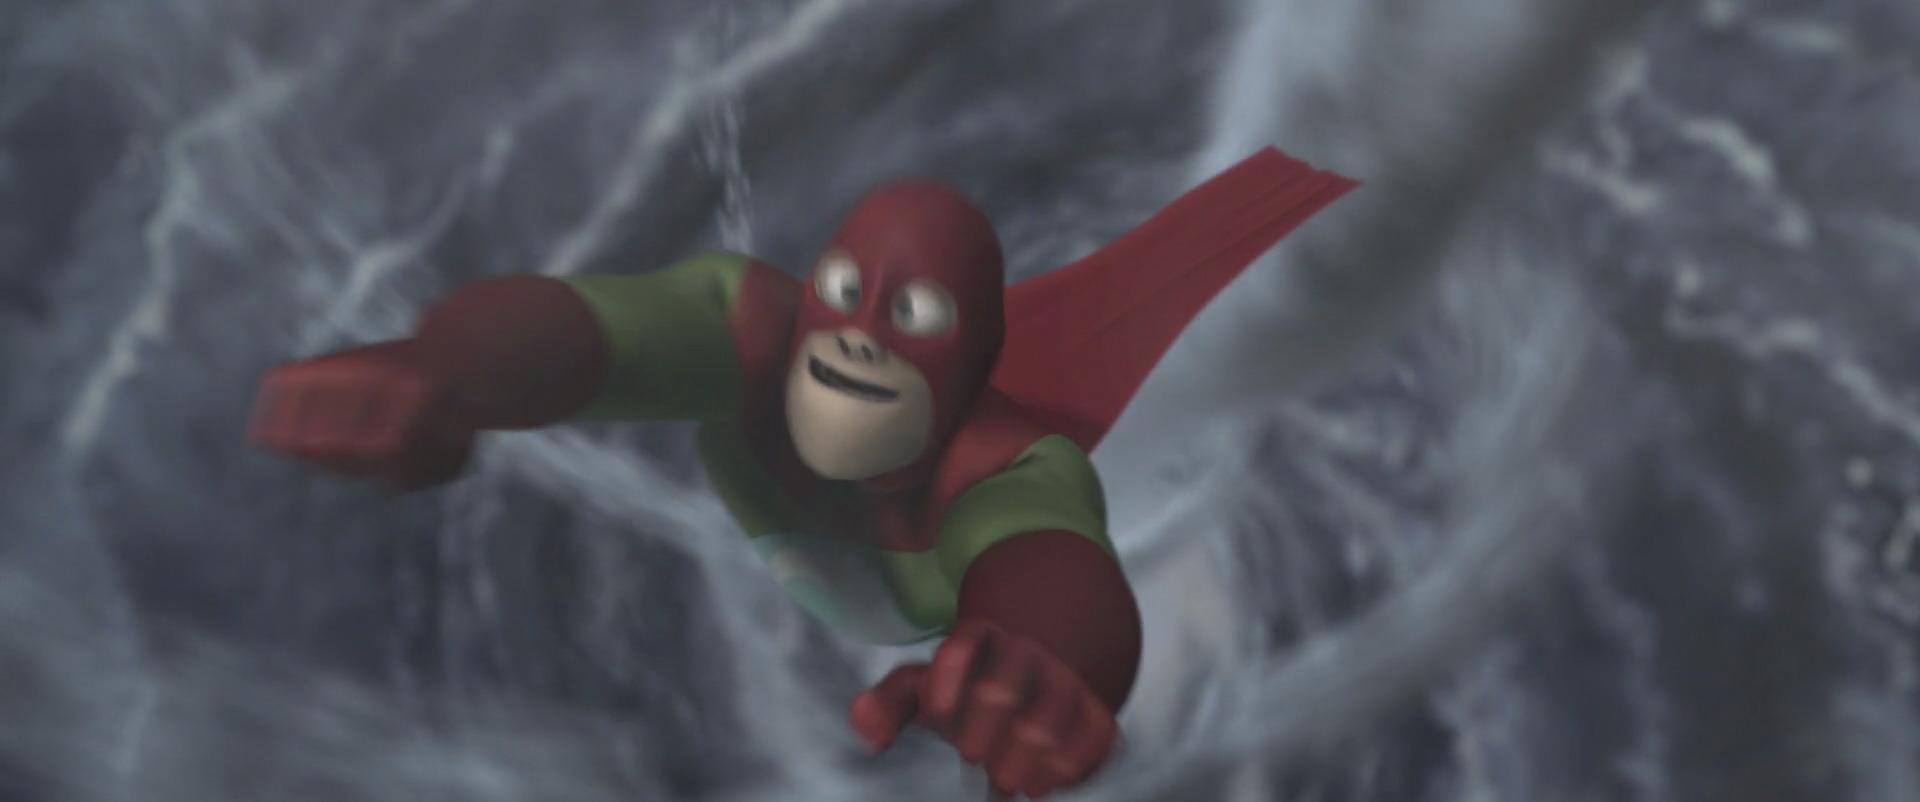 splahsman pixar disney personnage character indestructibles incredibles